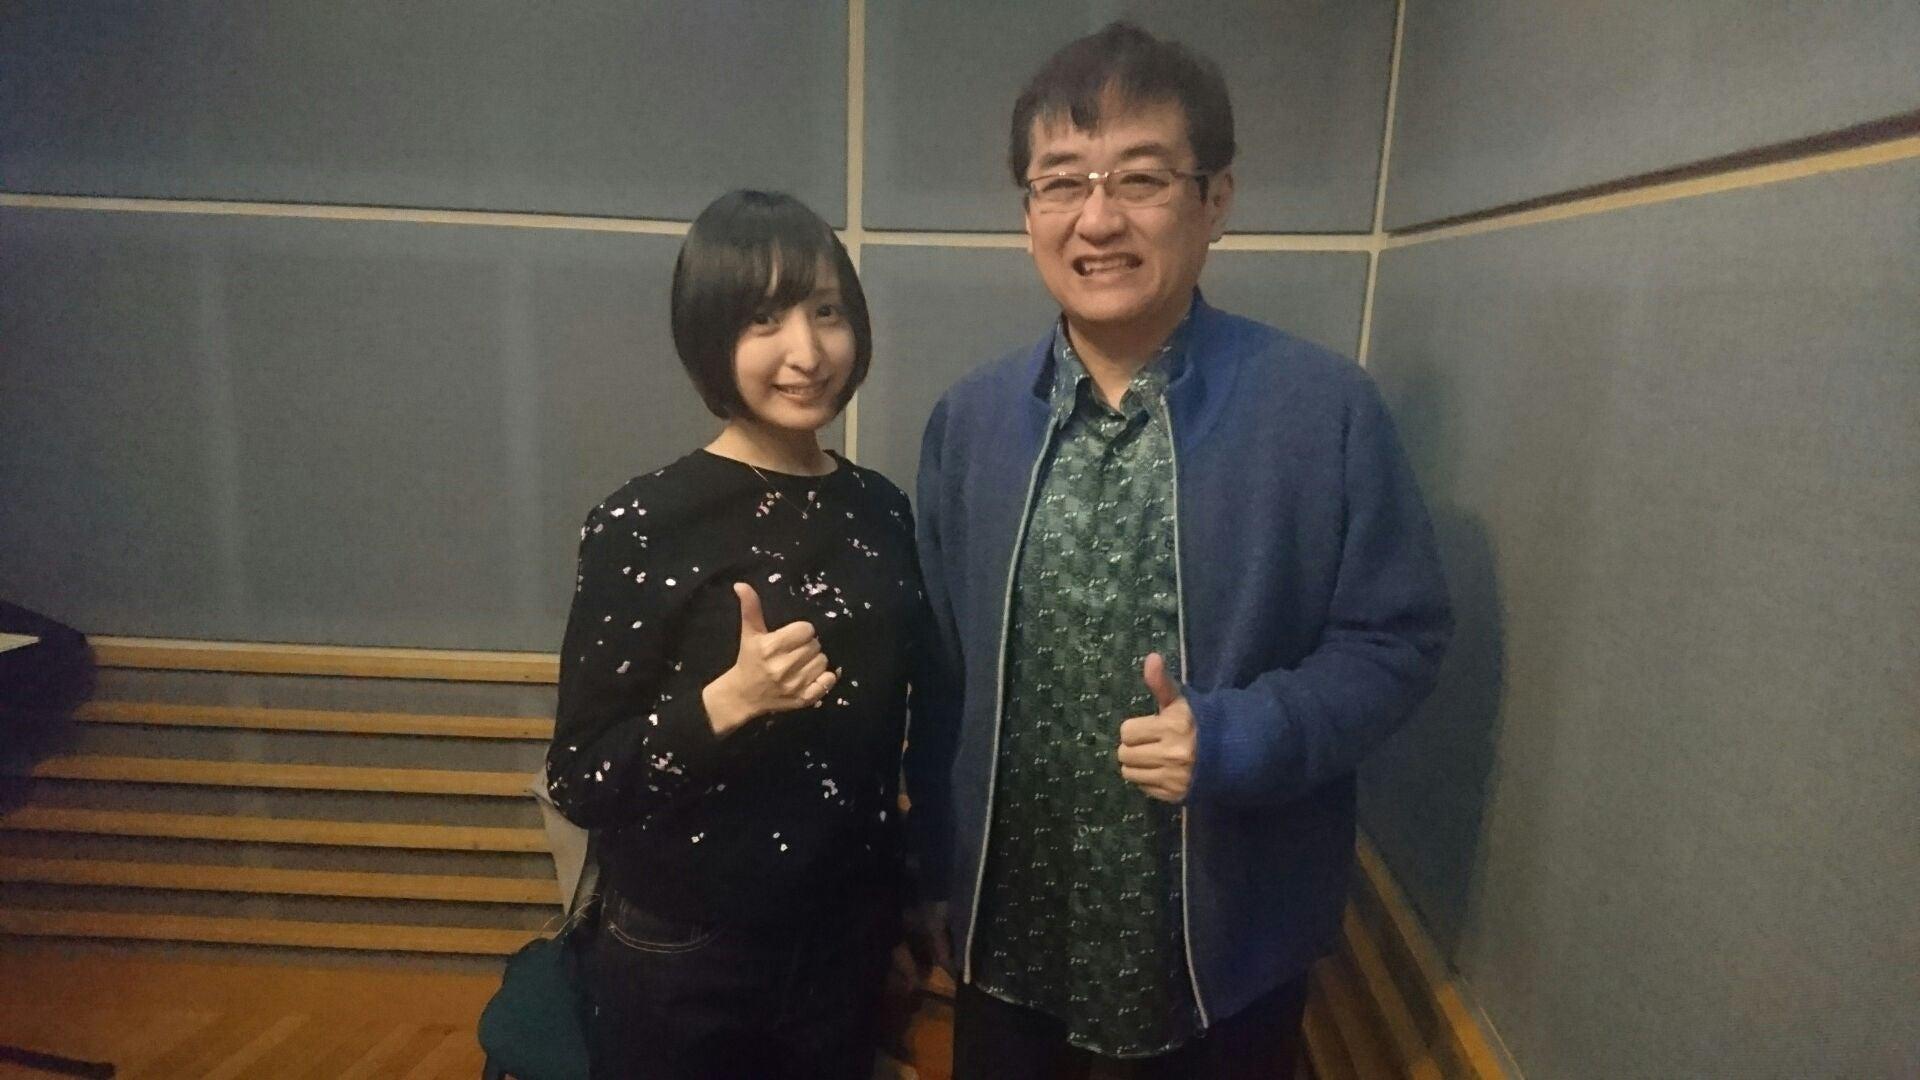 公平 田中